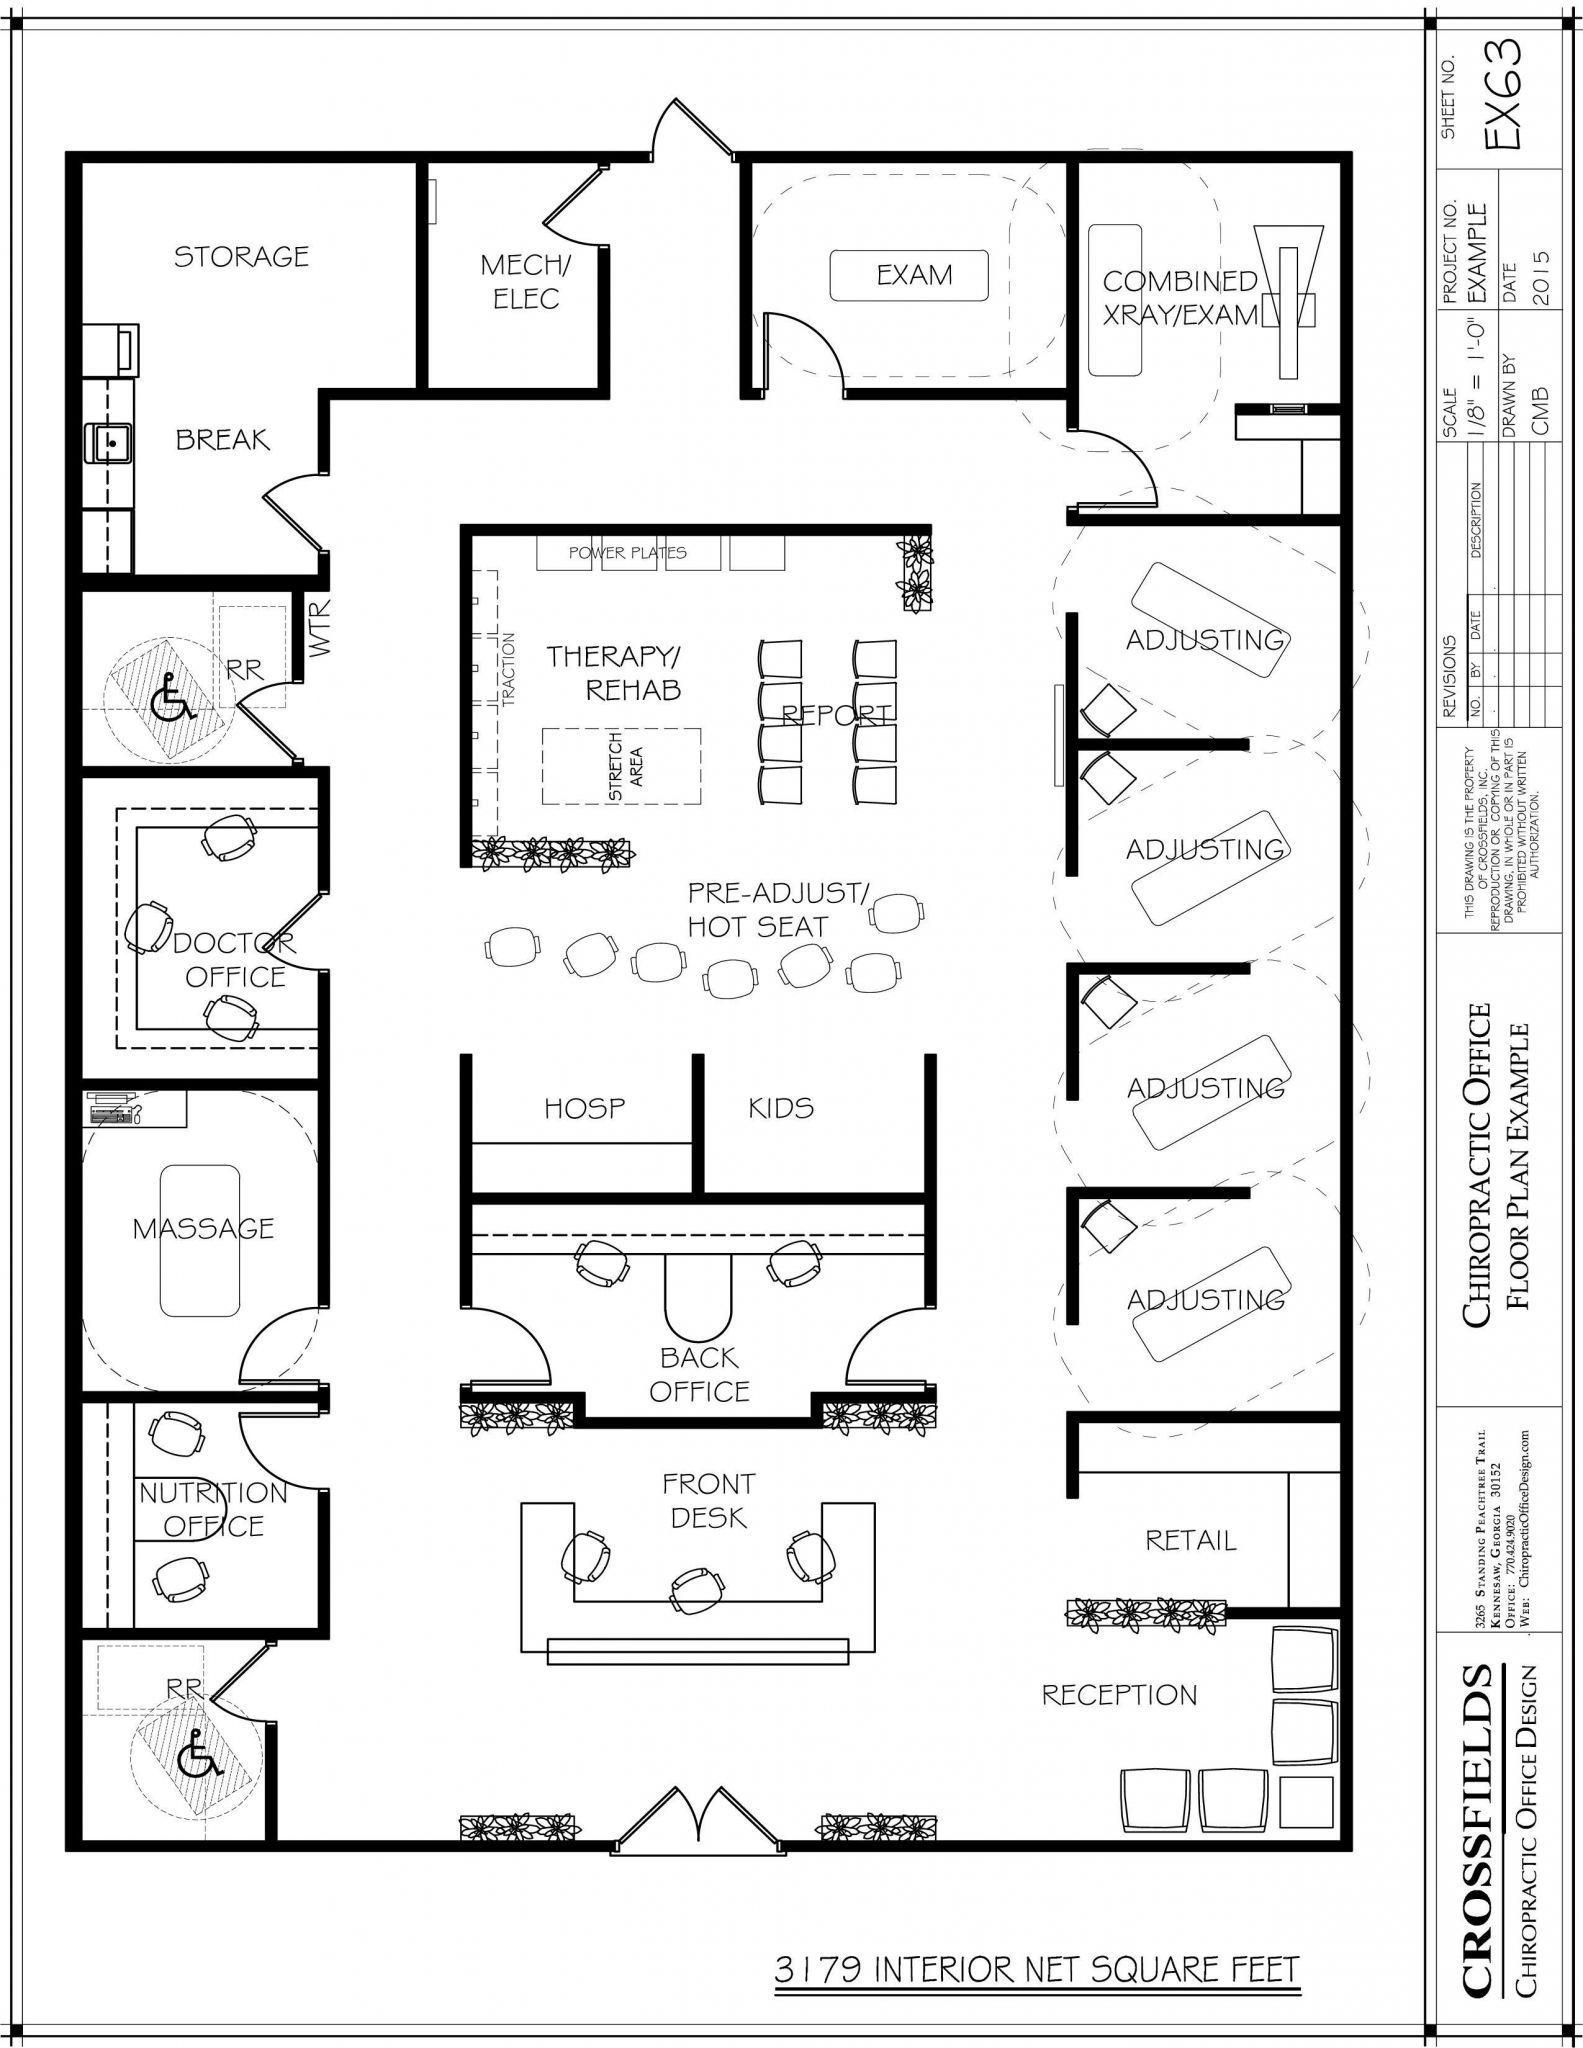 Medical Clinic Floor Plan Design Sample Unique Chiropractic Fice Floor Plans Pinterest Medica Chiropractic Office Design Office Floor Plan Doctor Office Design